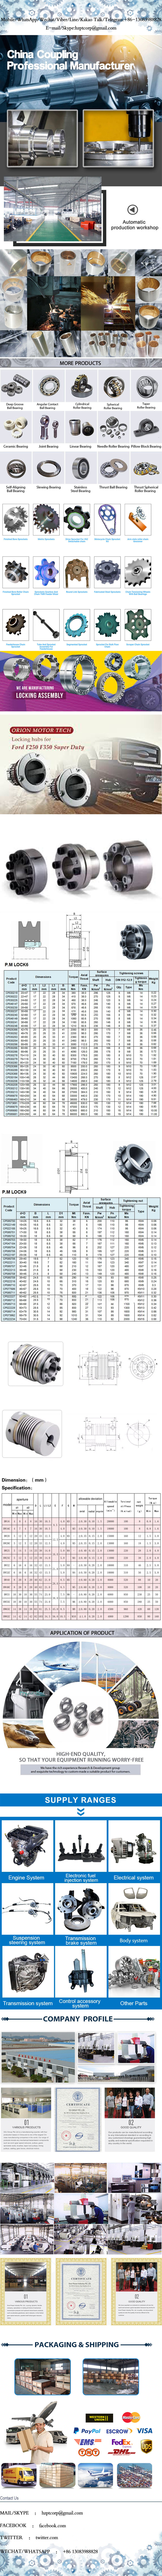 Cylinder Rim Lock for Rolling Shutters Garage Door Lock Hardware